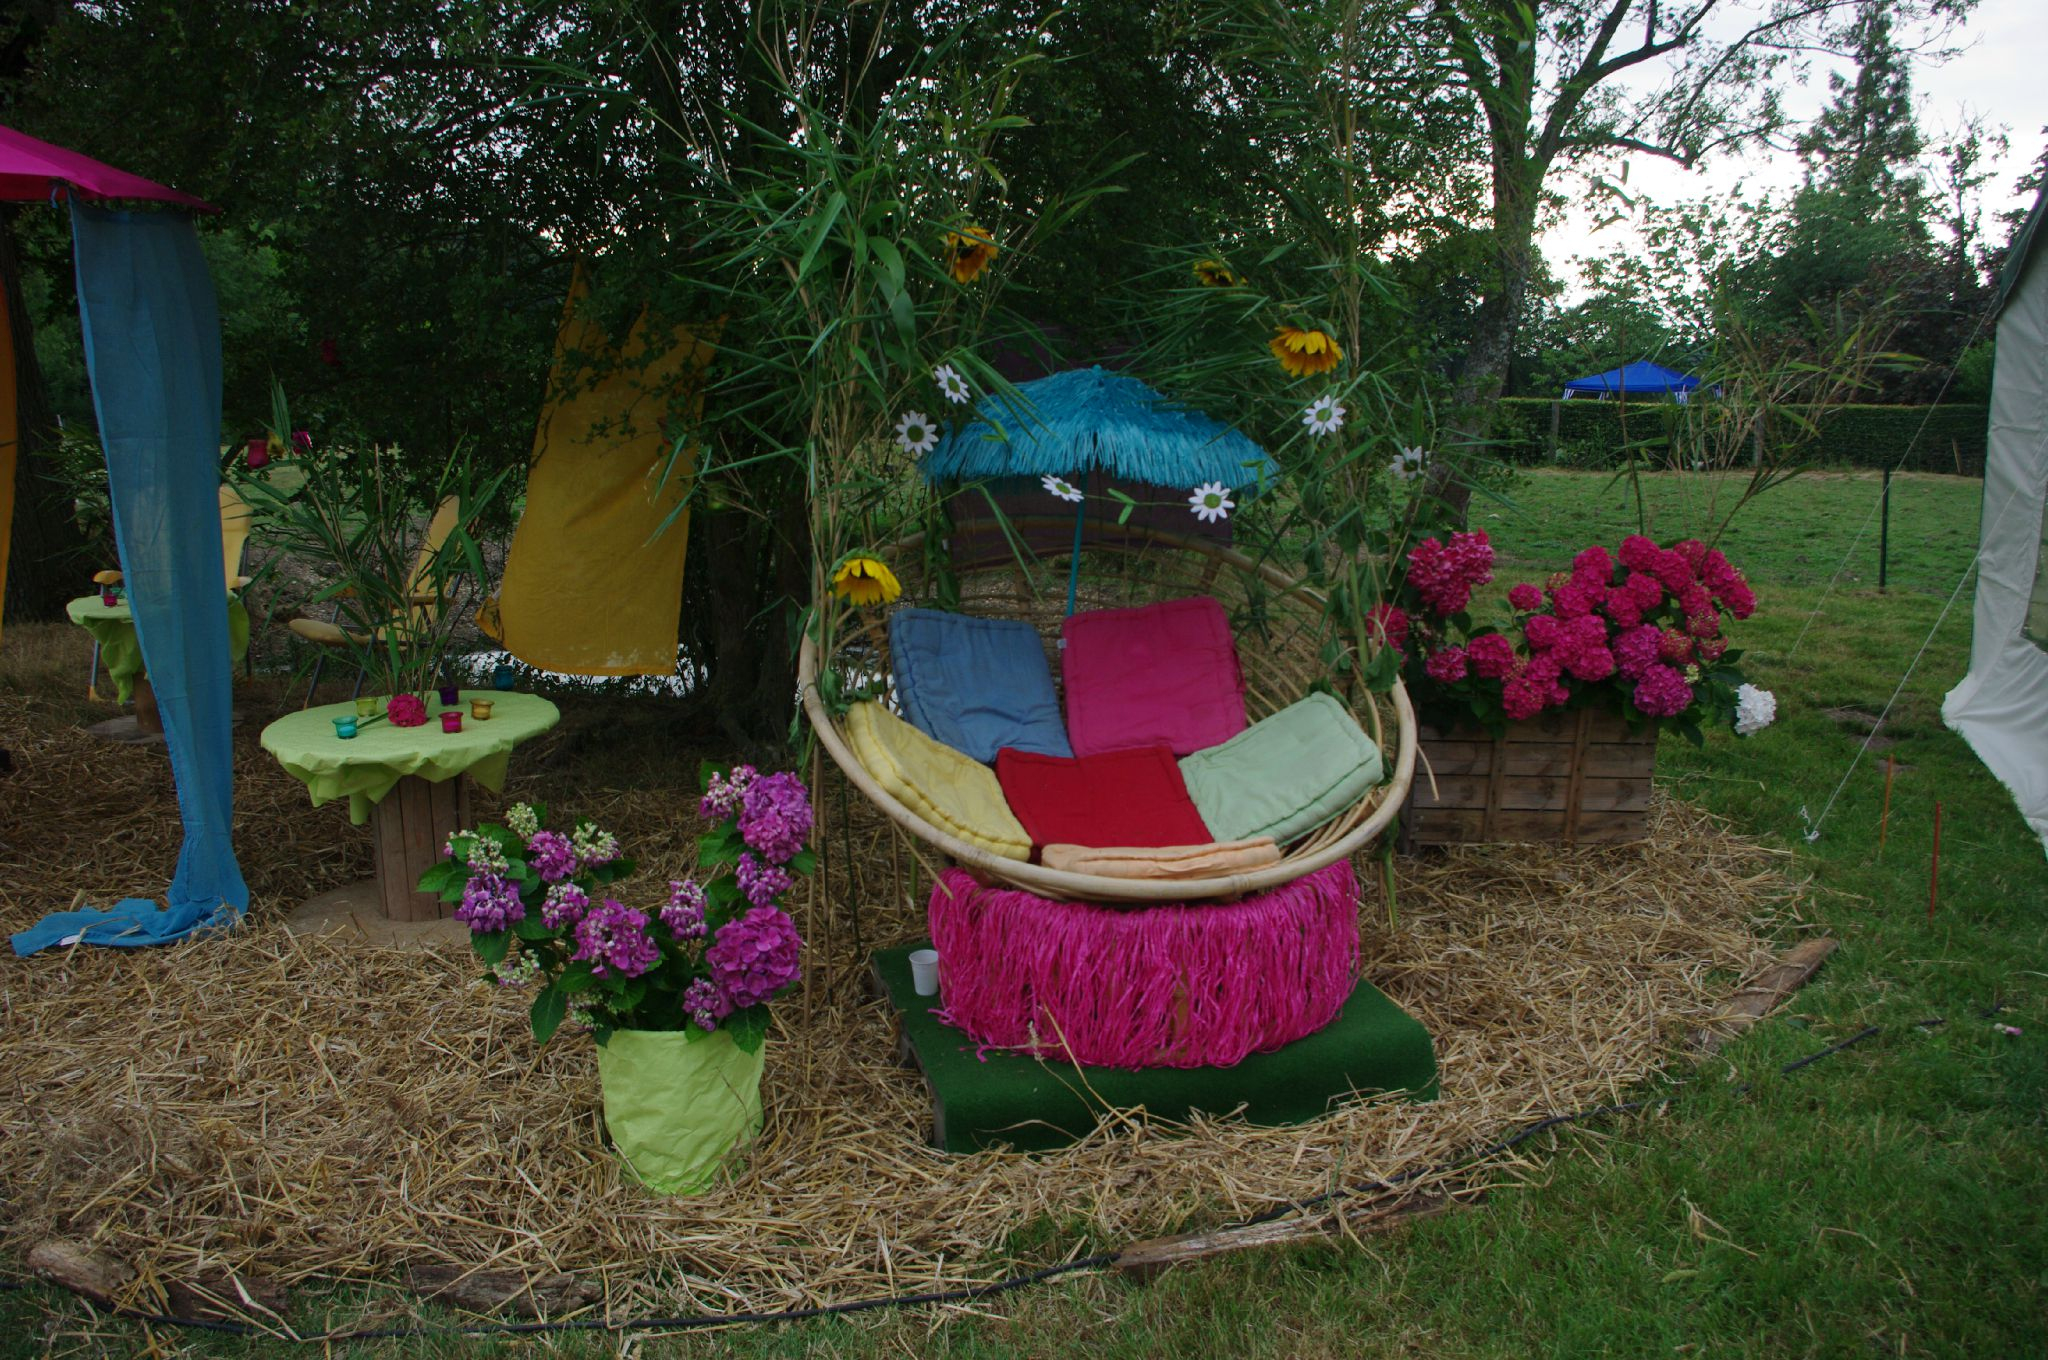 Cuisine: Conception Dã©Co Jardin Extã©Rieur Deco Jardin ... concernant Objet Decoration Jardin